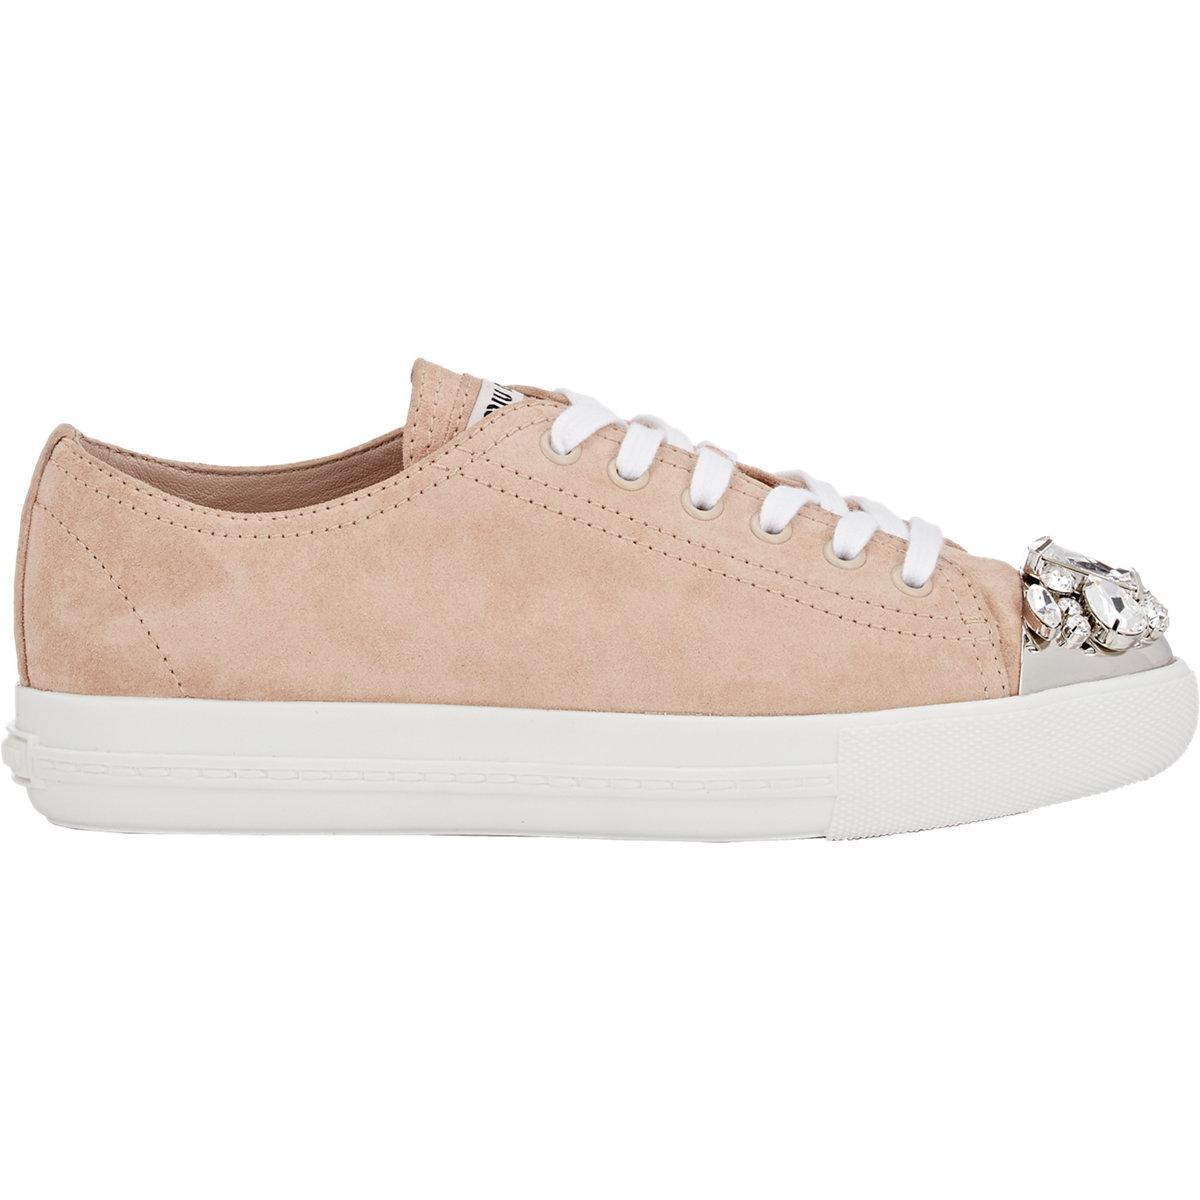 Miu Miu Jeweled Cap-toe Sneakers in